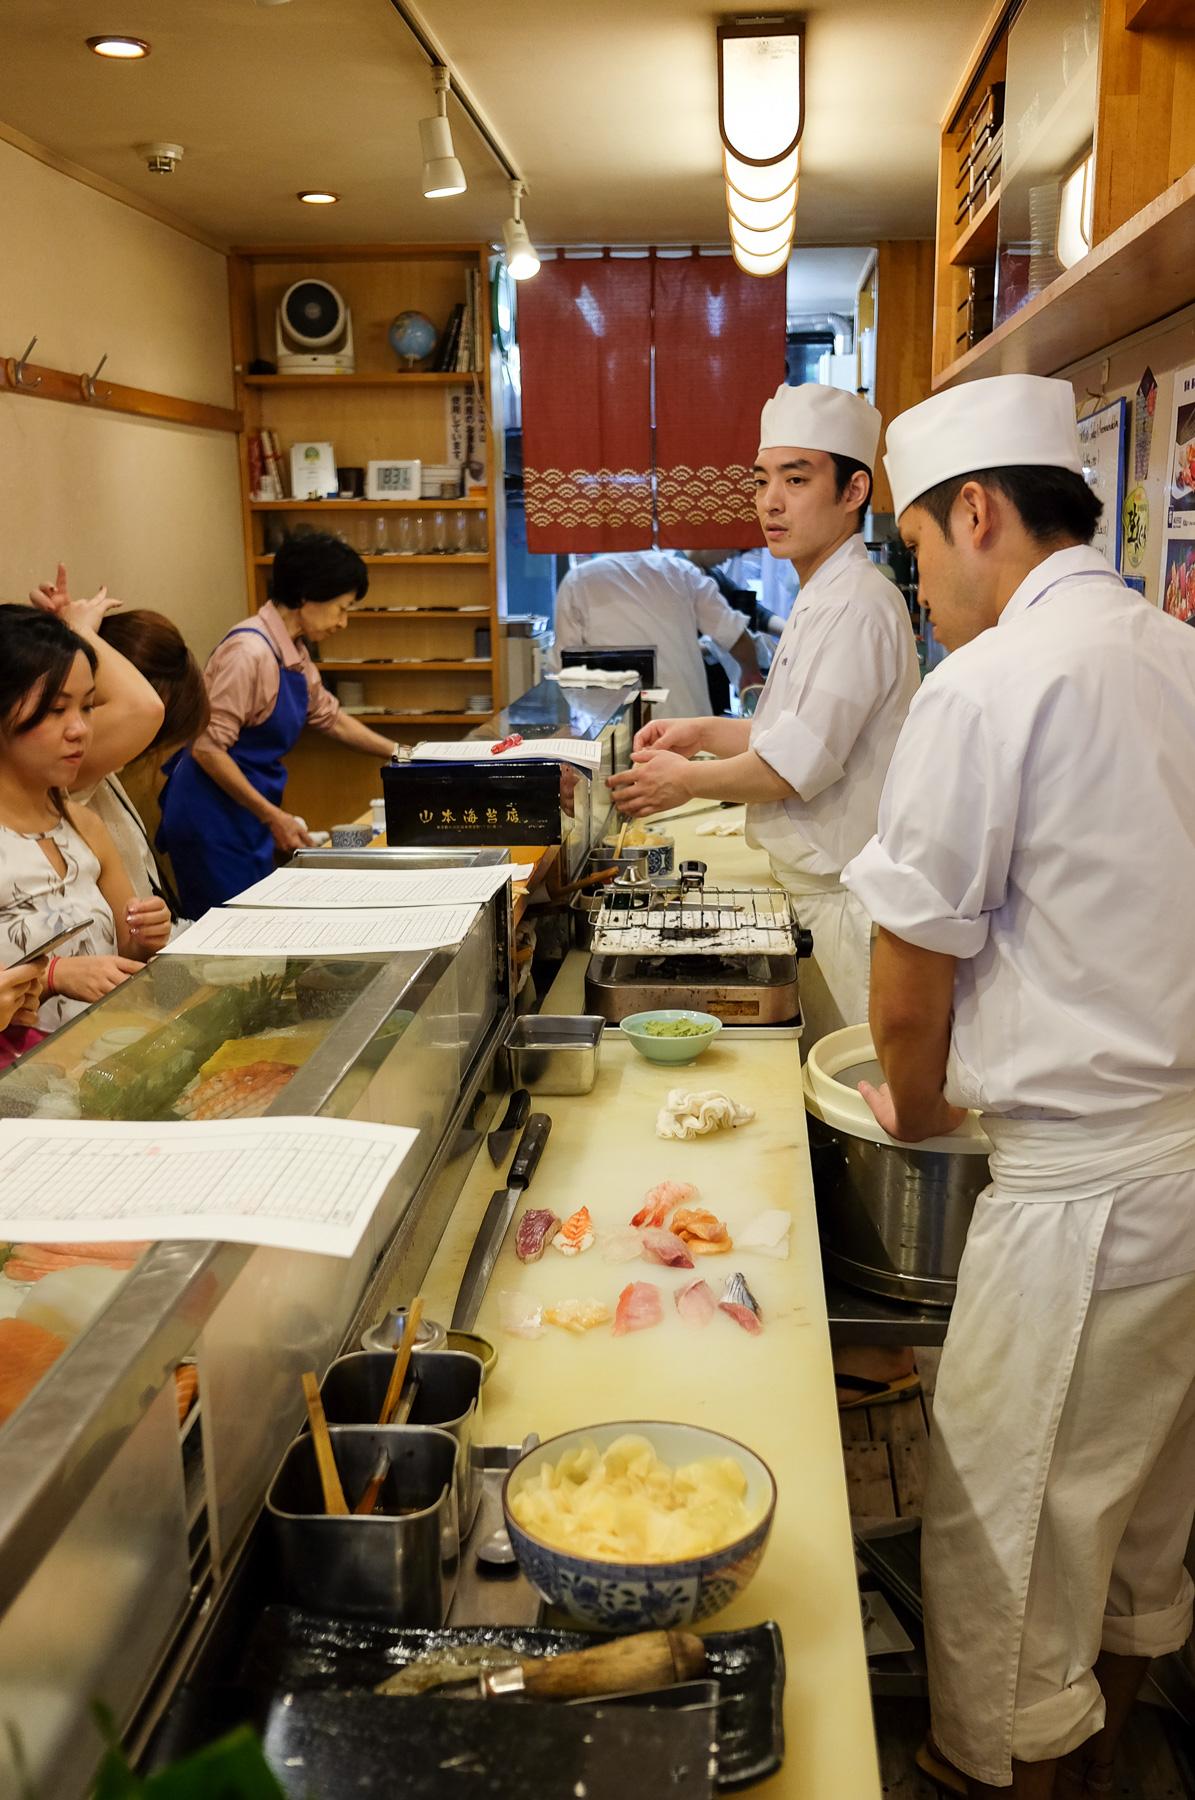 Sushi früh morgens!